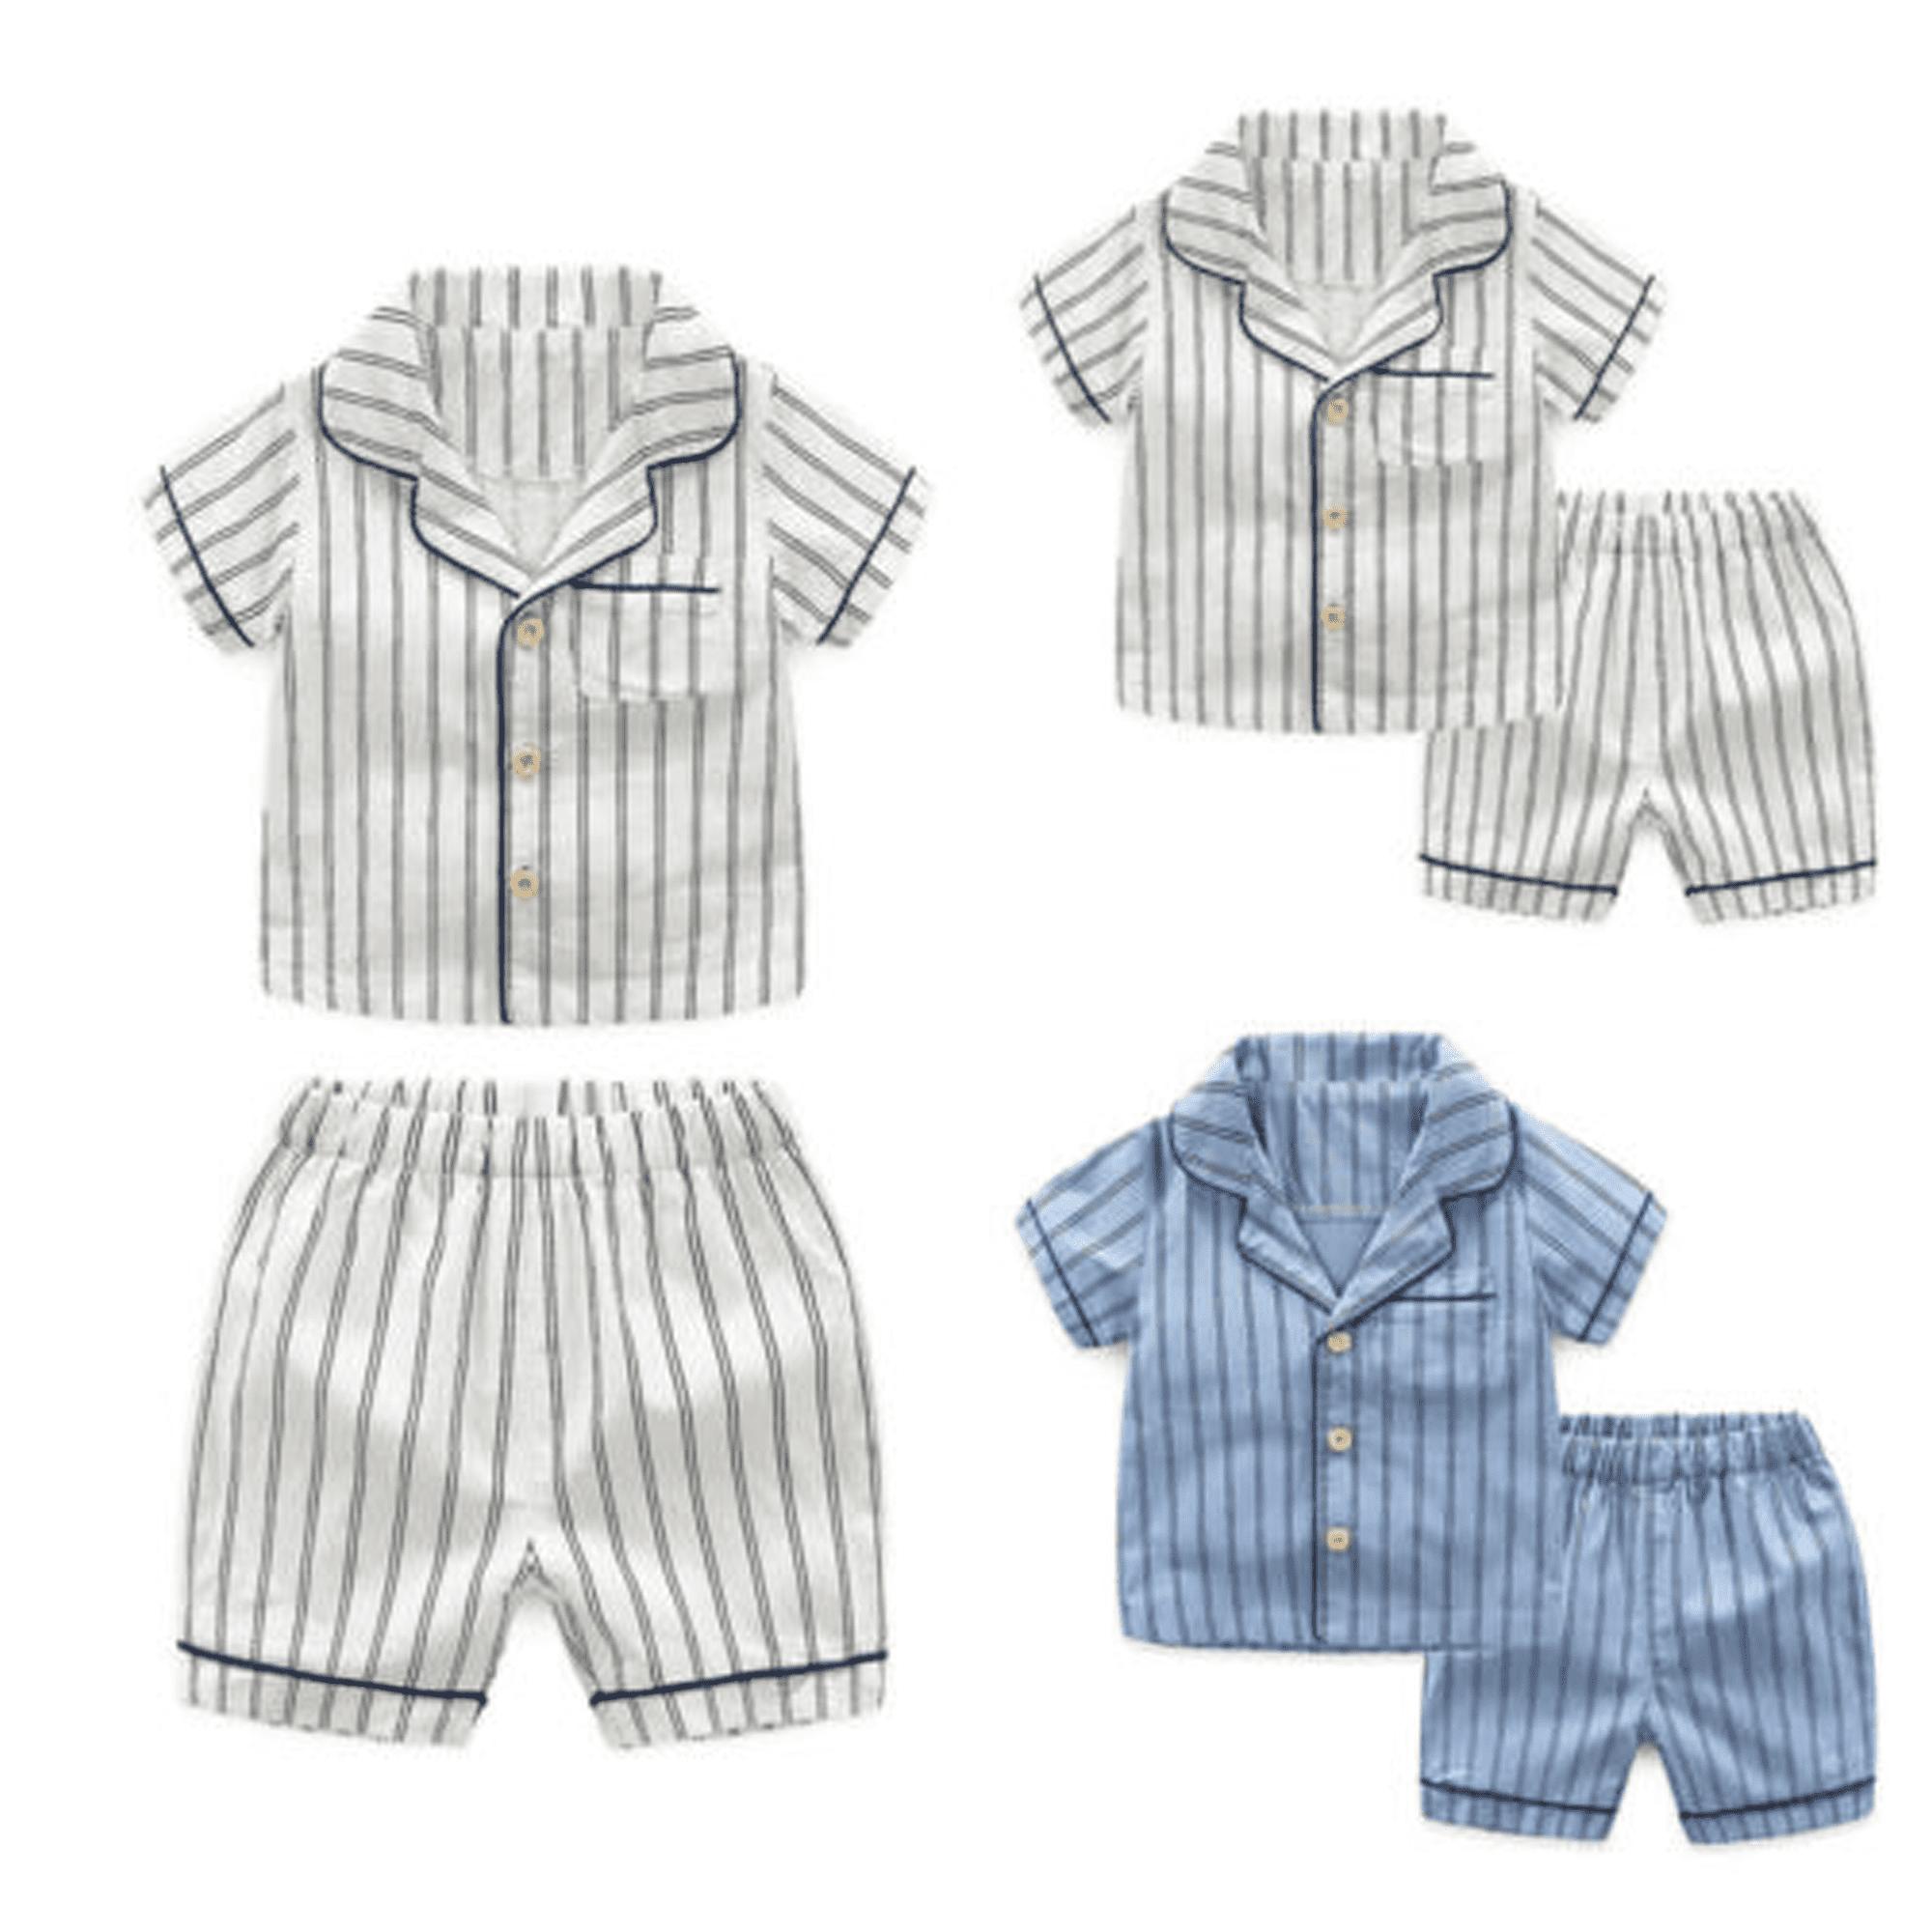 Boys Minions Pyjamas Short Summer Pjs Age 3 to 10 Years